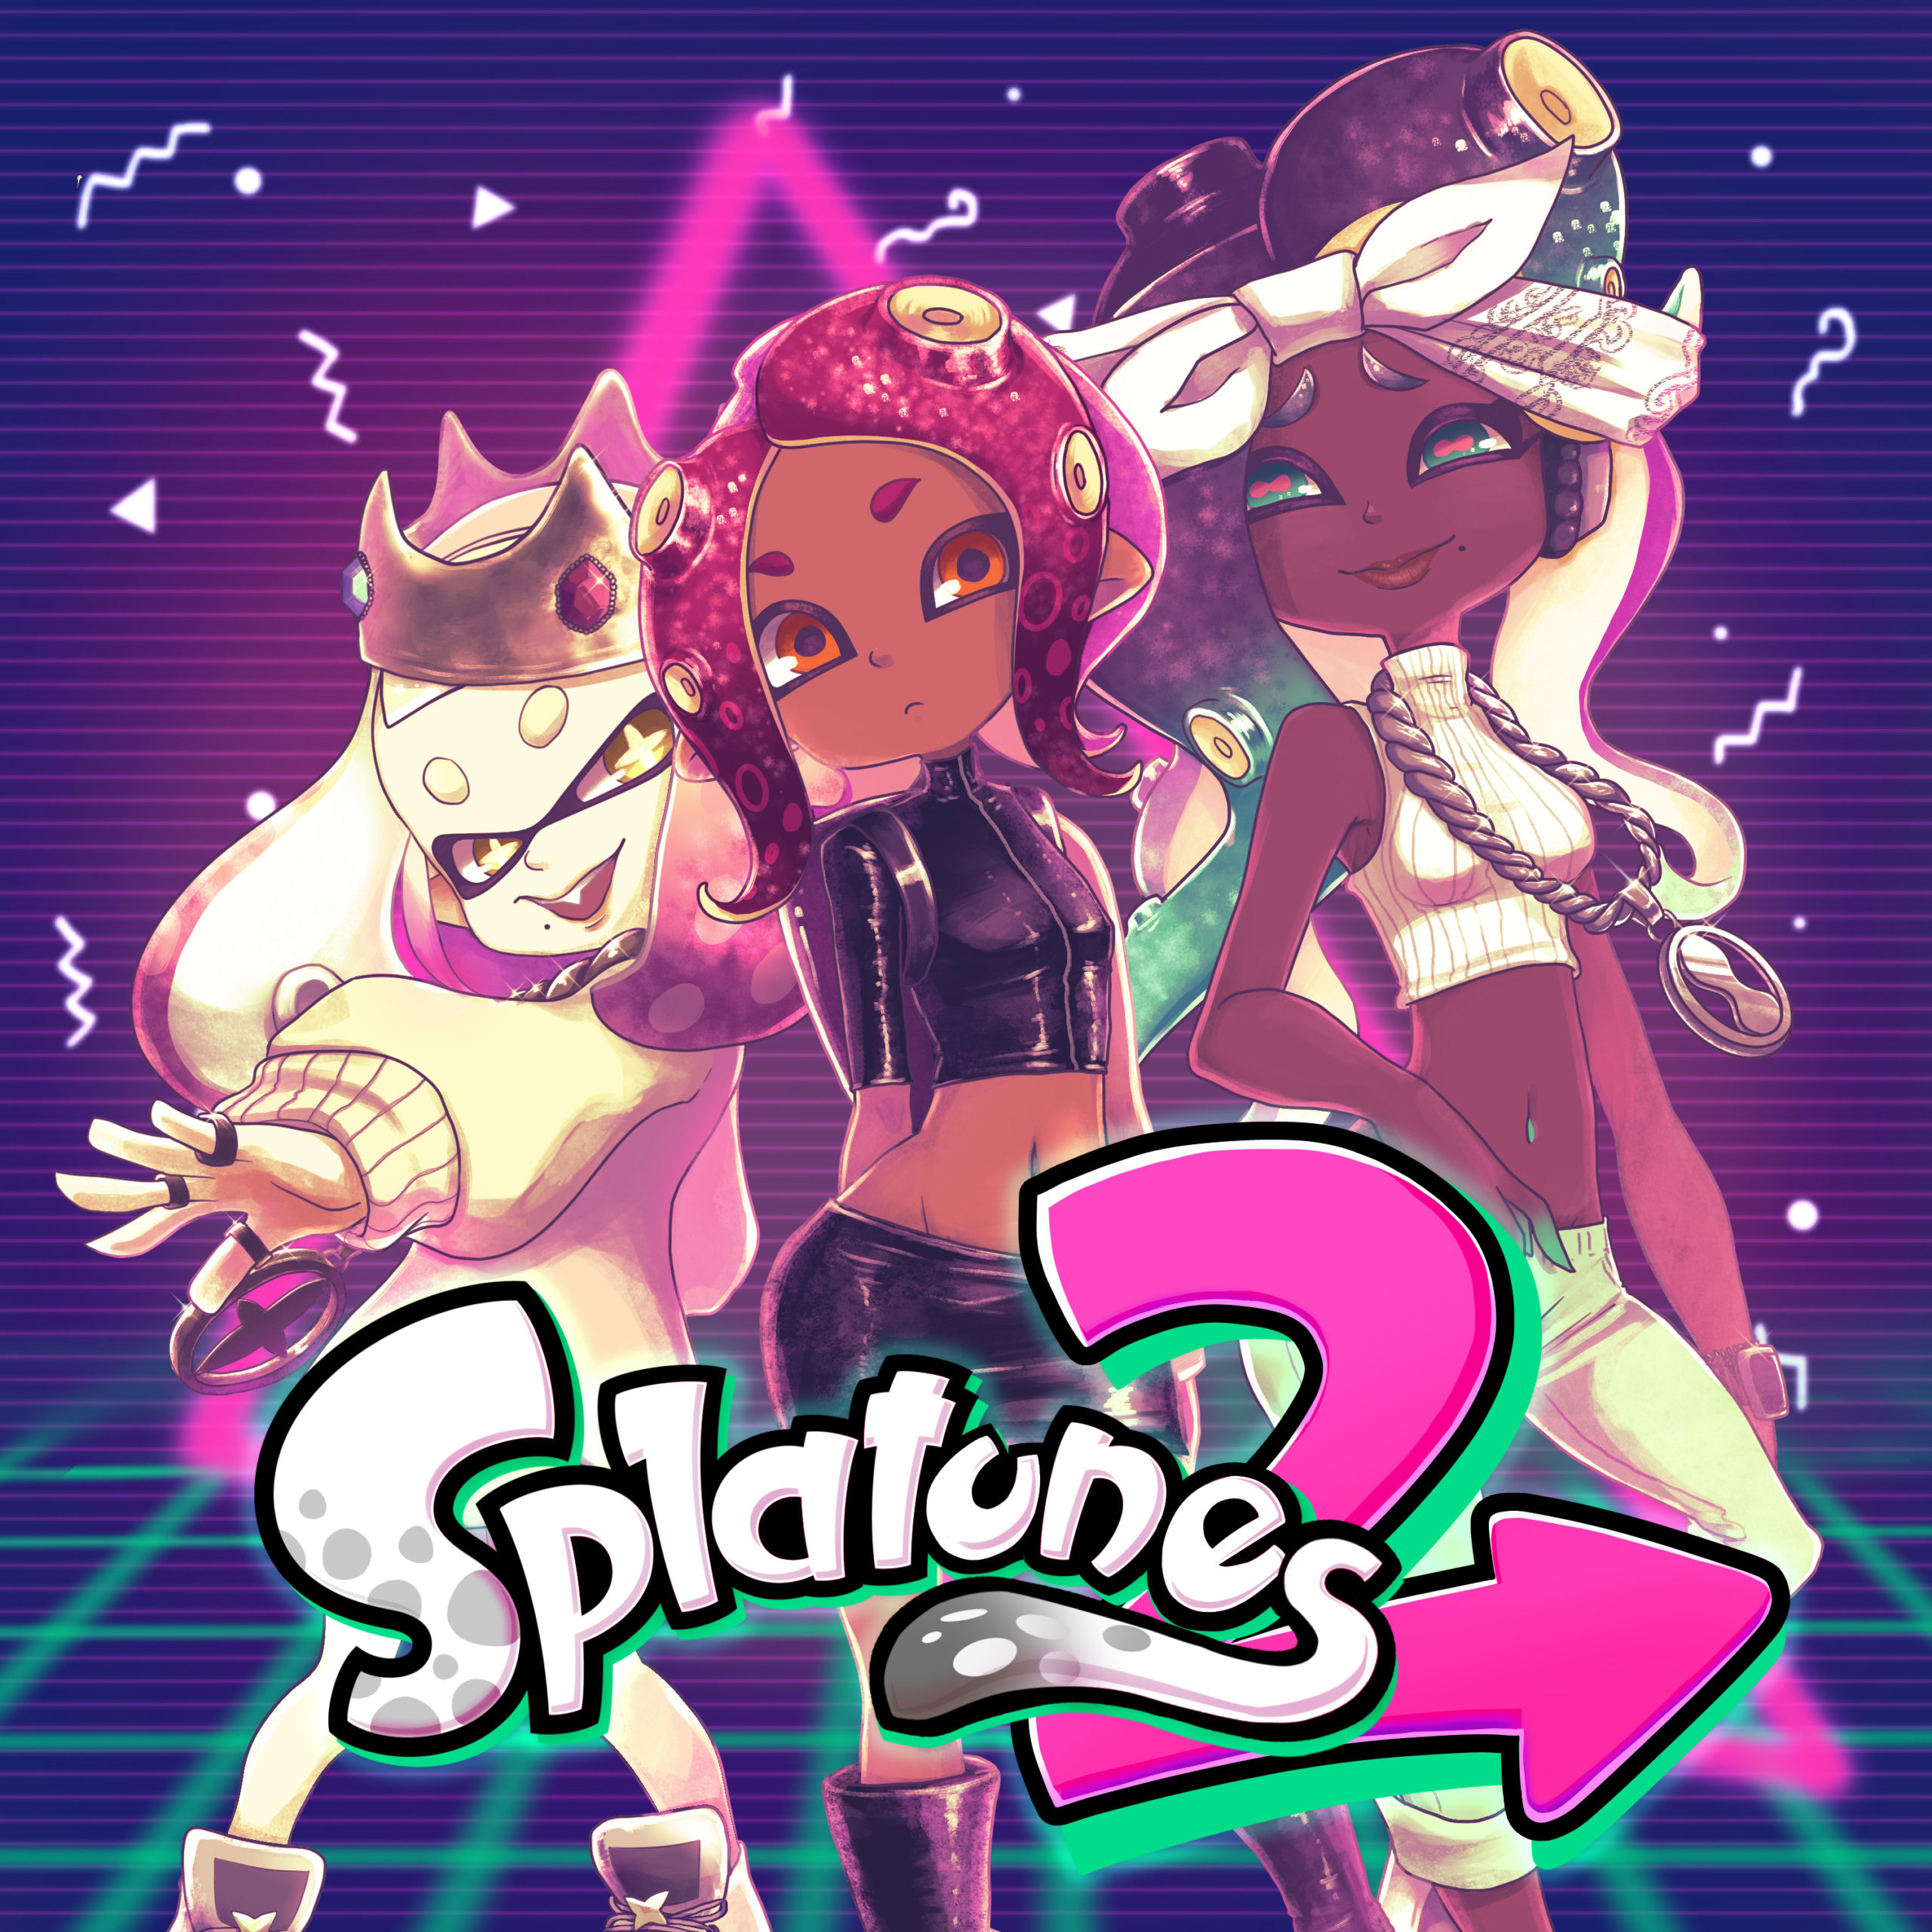 Splatunes 2